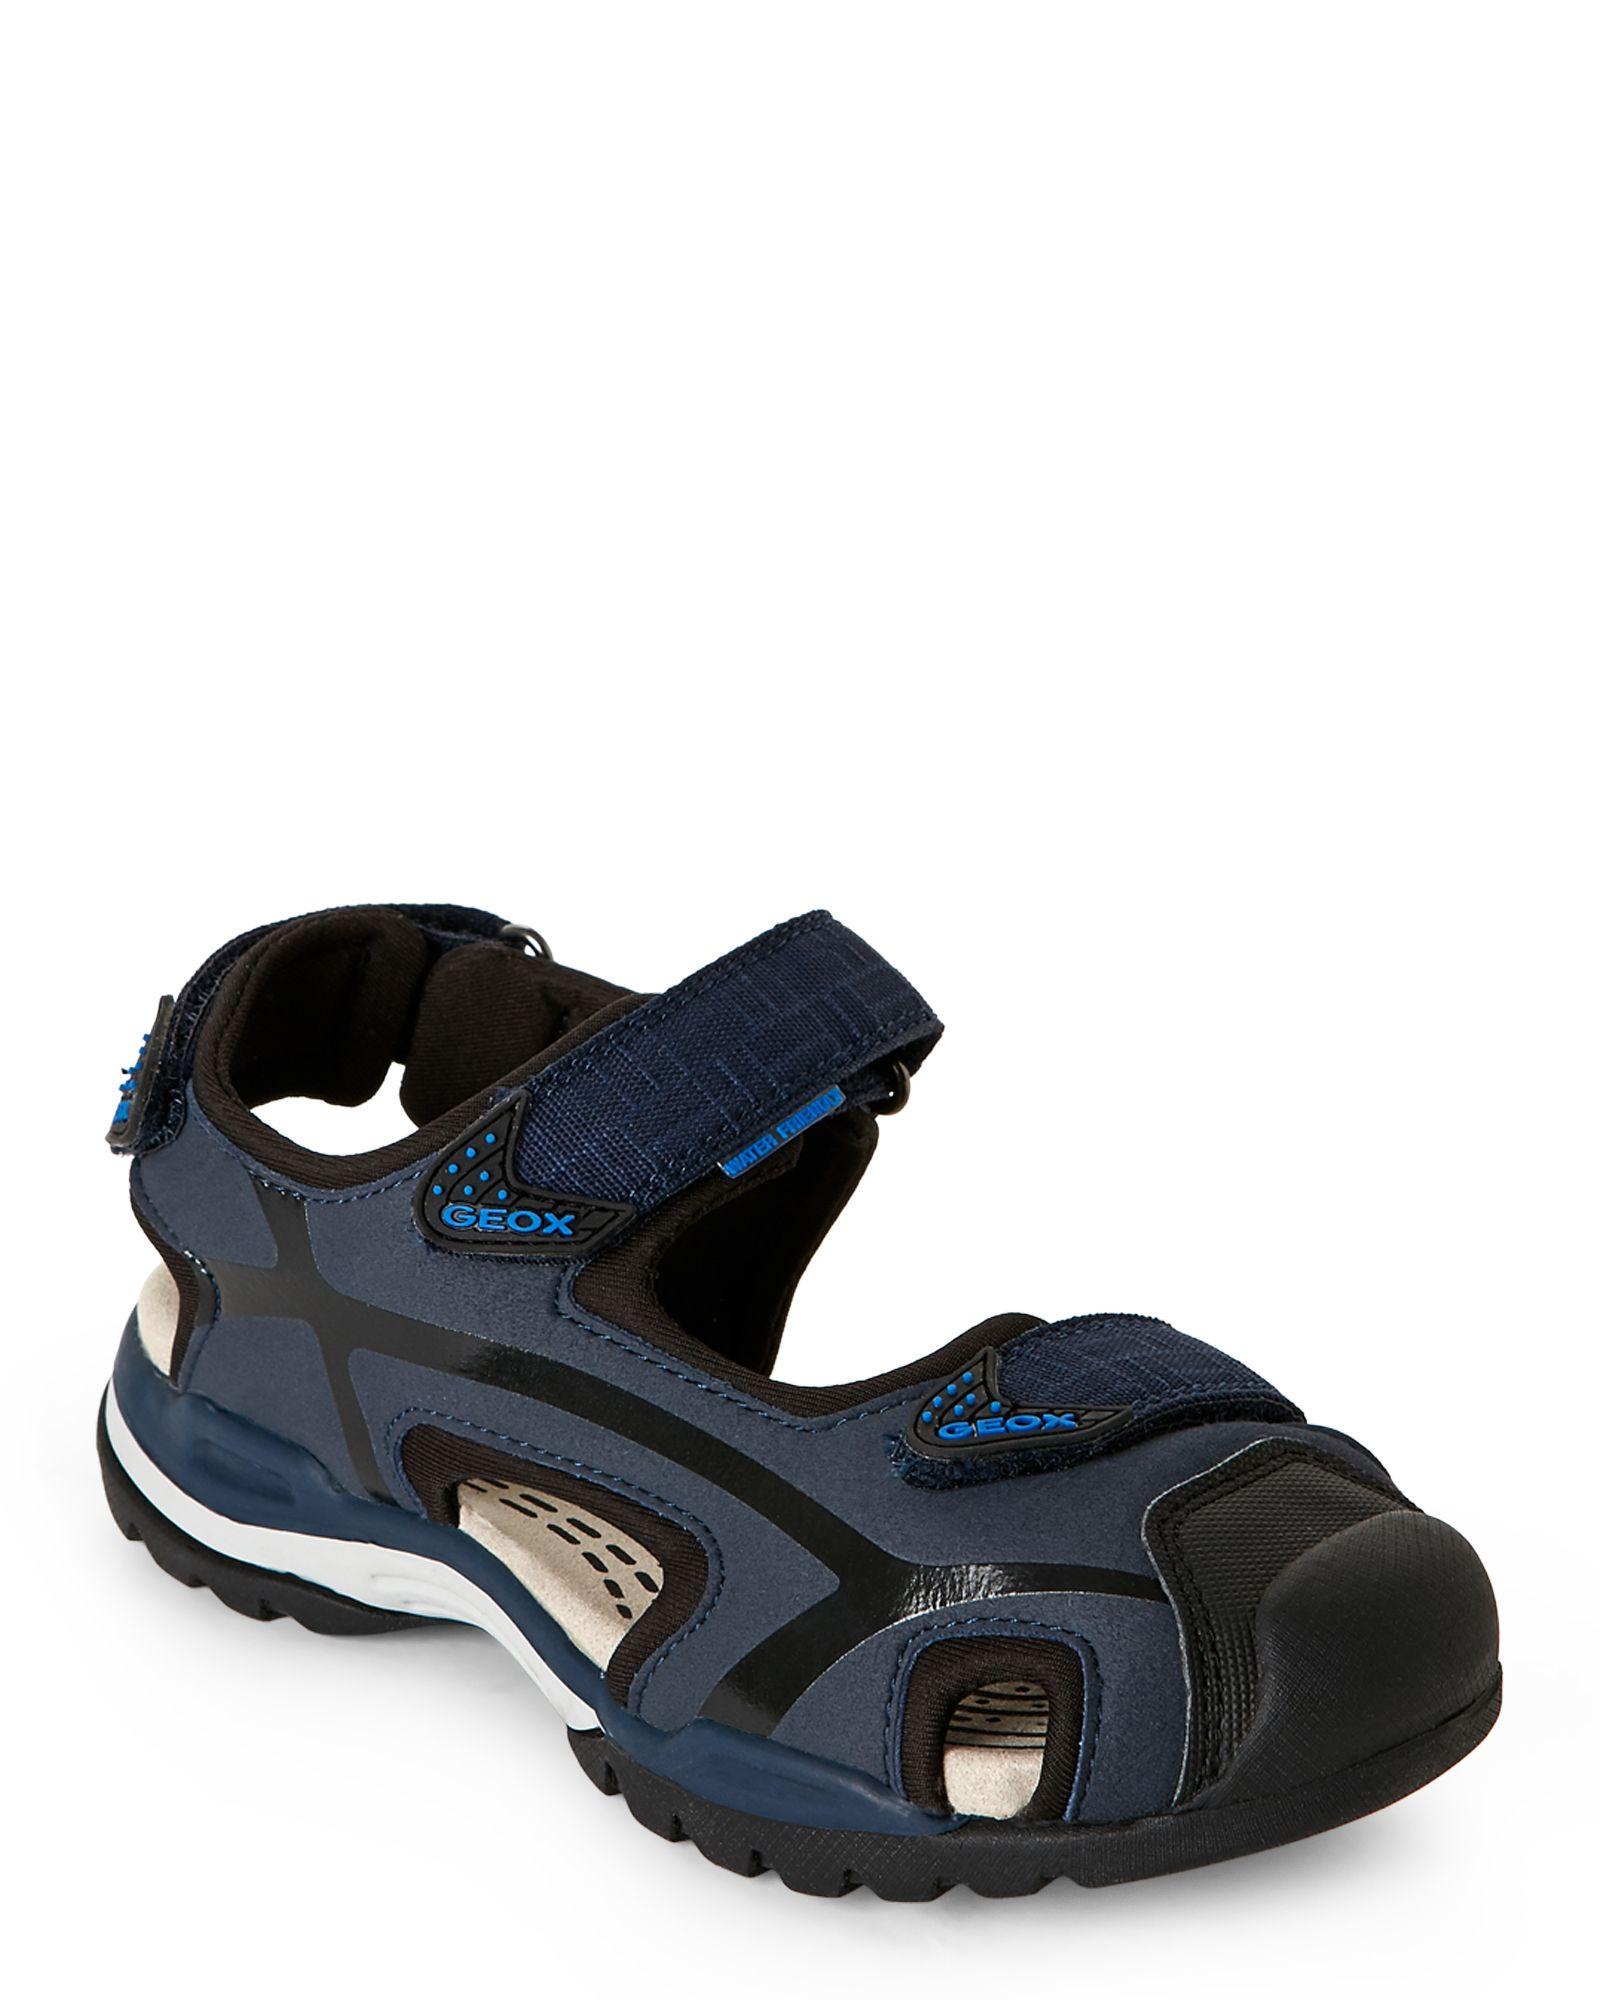 Geox Respira (Kids Boys) Navy & Black Borealis Sandals